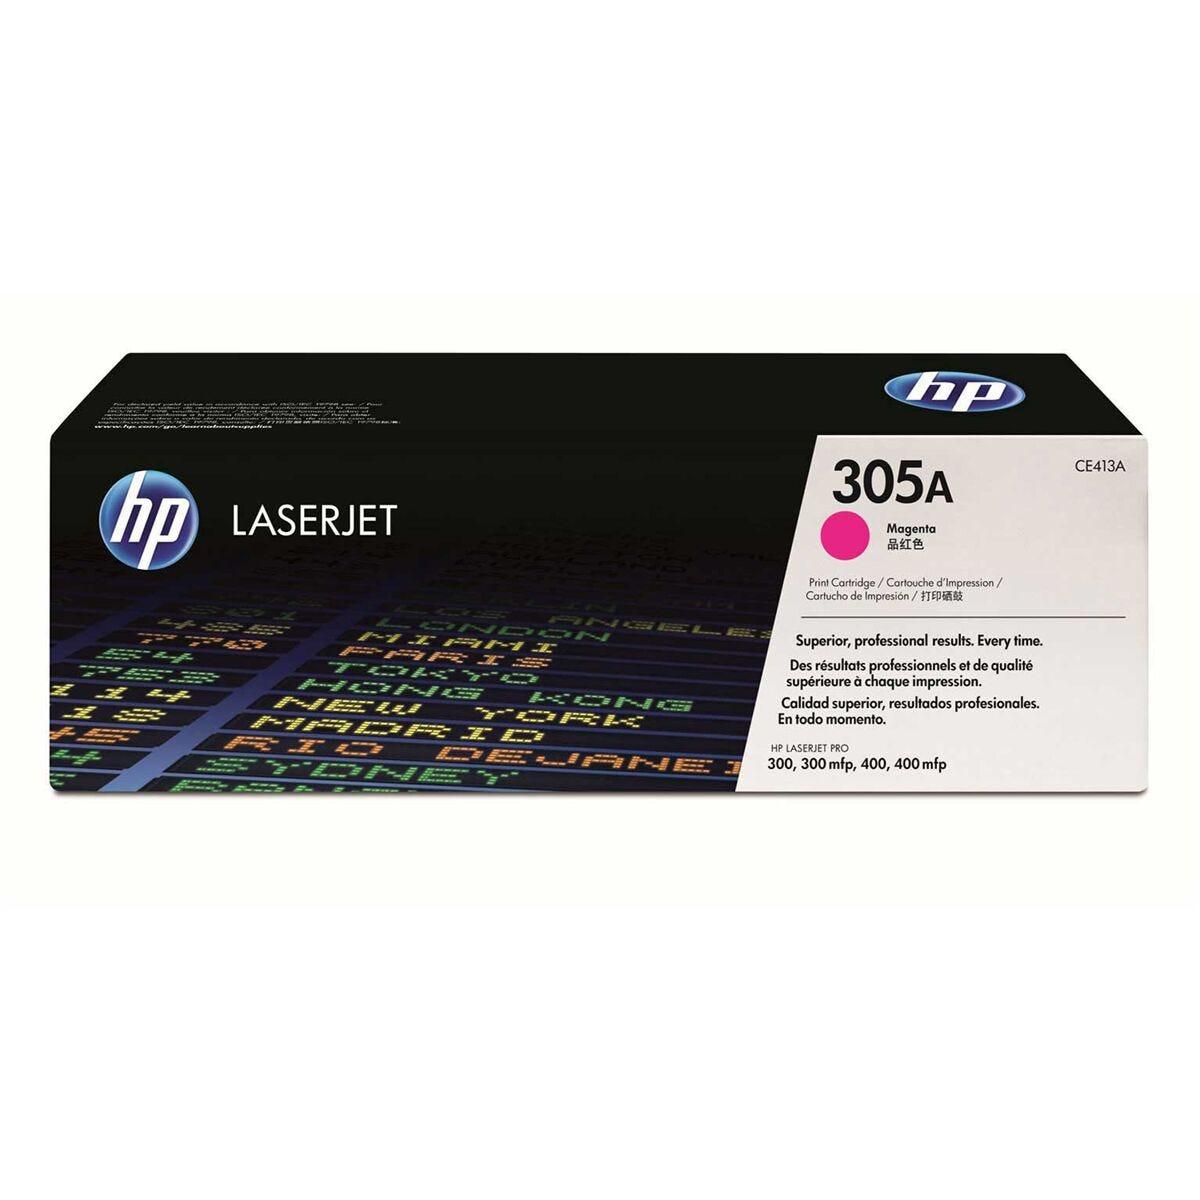 HP 305A Printer Ink Toner Cartridge CE413A